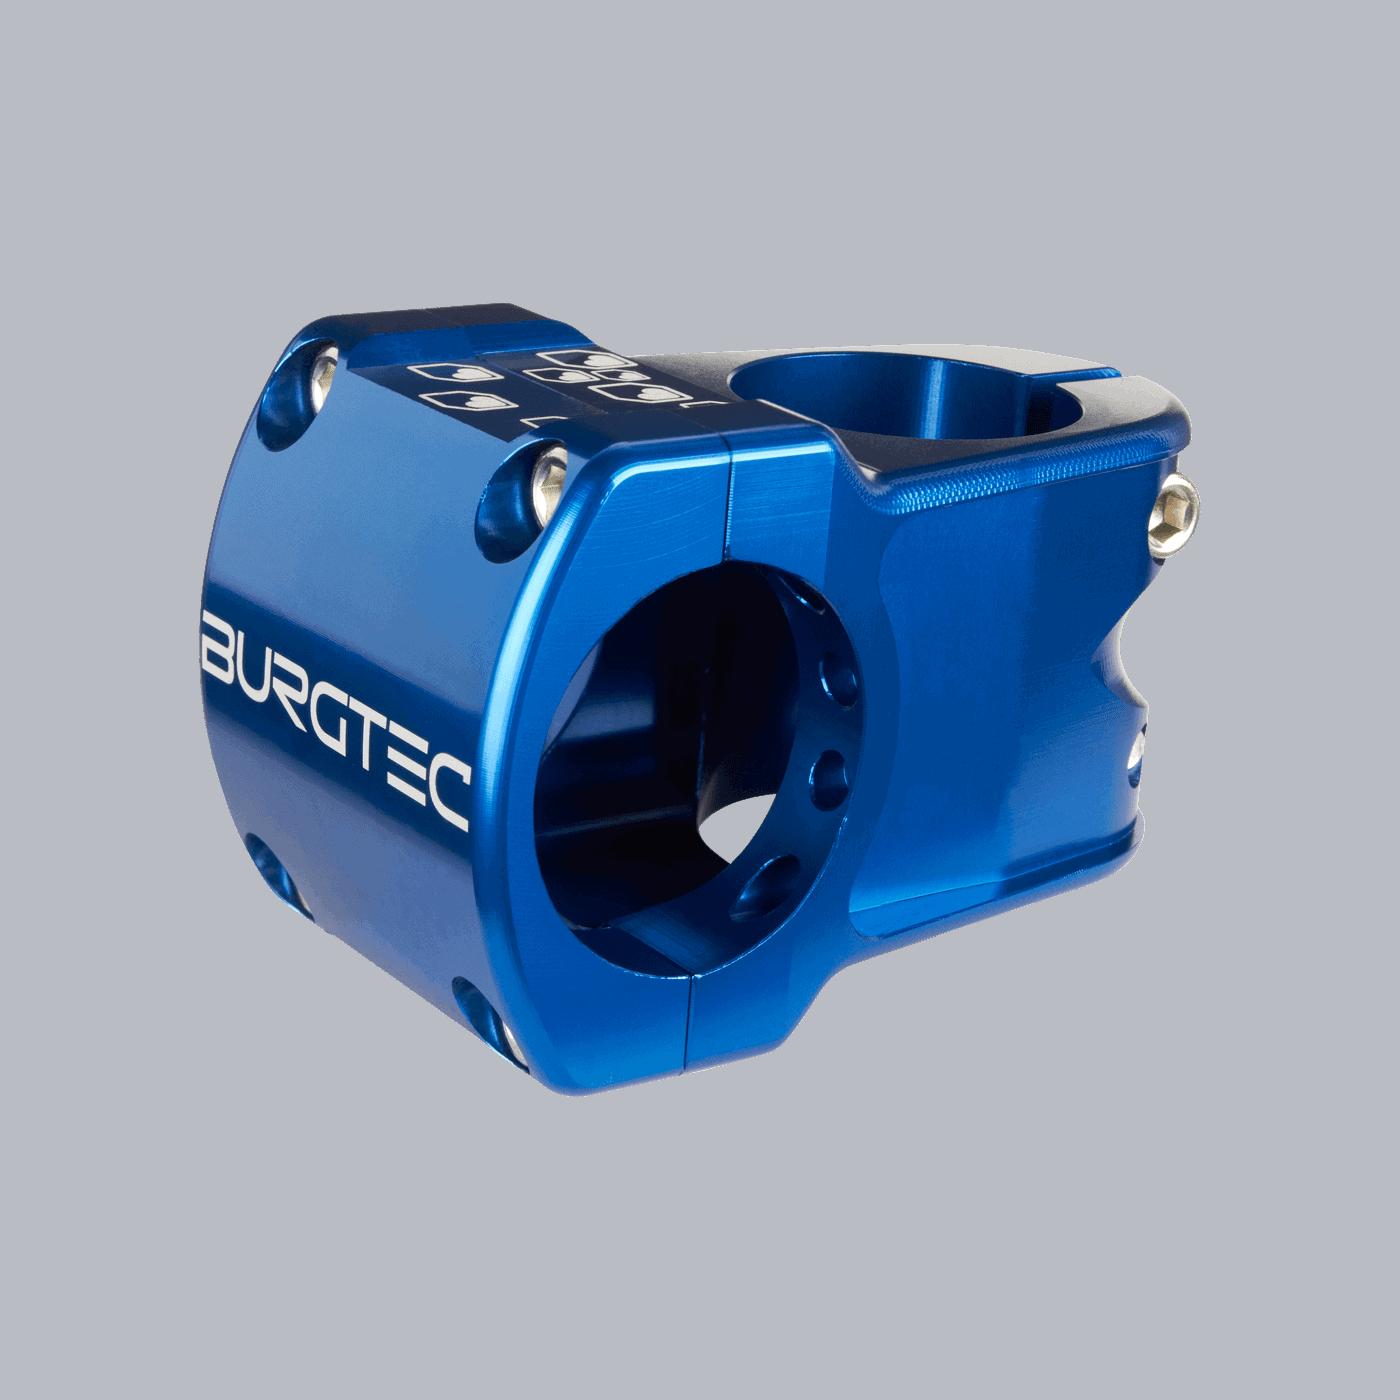 Burgtec Enduro Stem 35mm Deep Blue